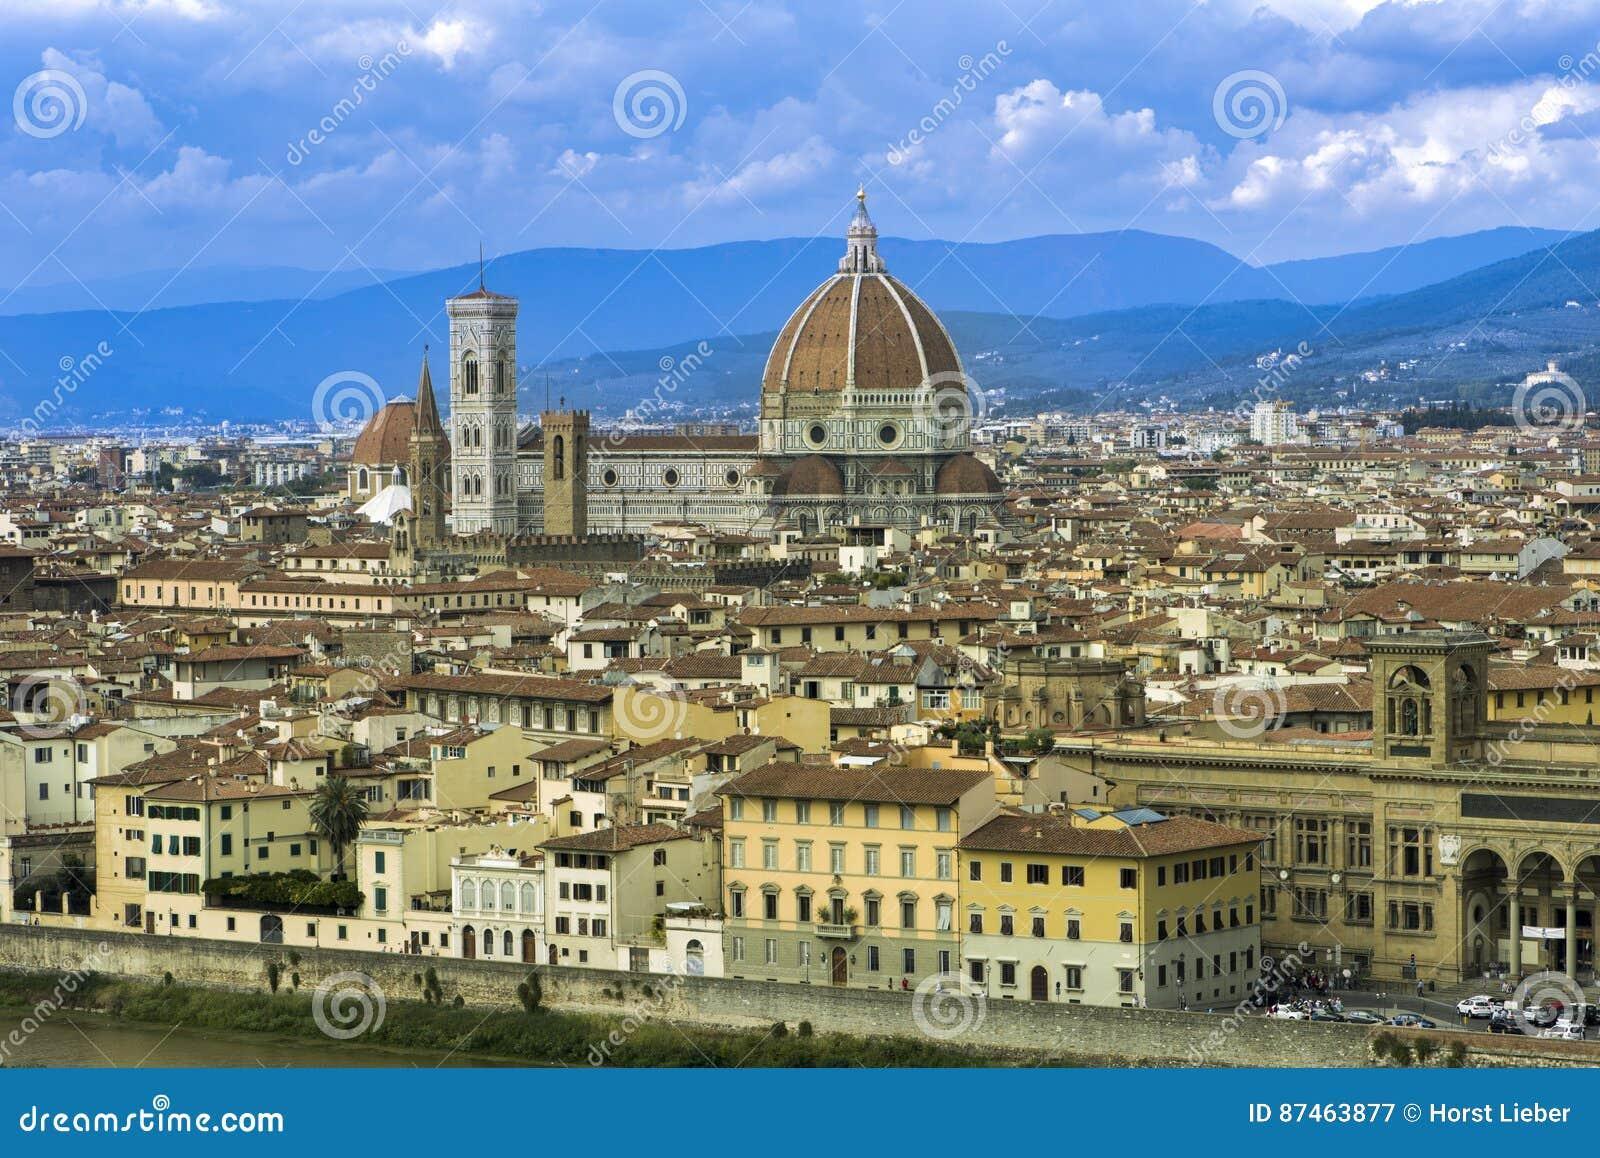 Live cam Florence   Florence Italy City Cam